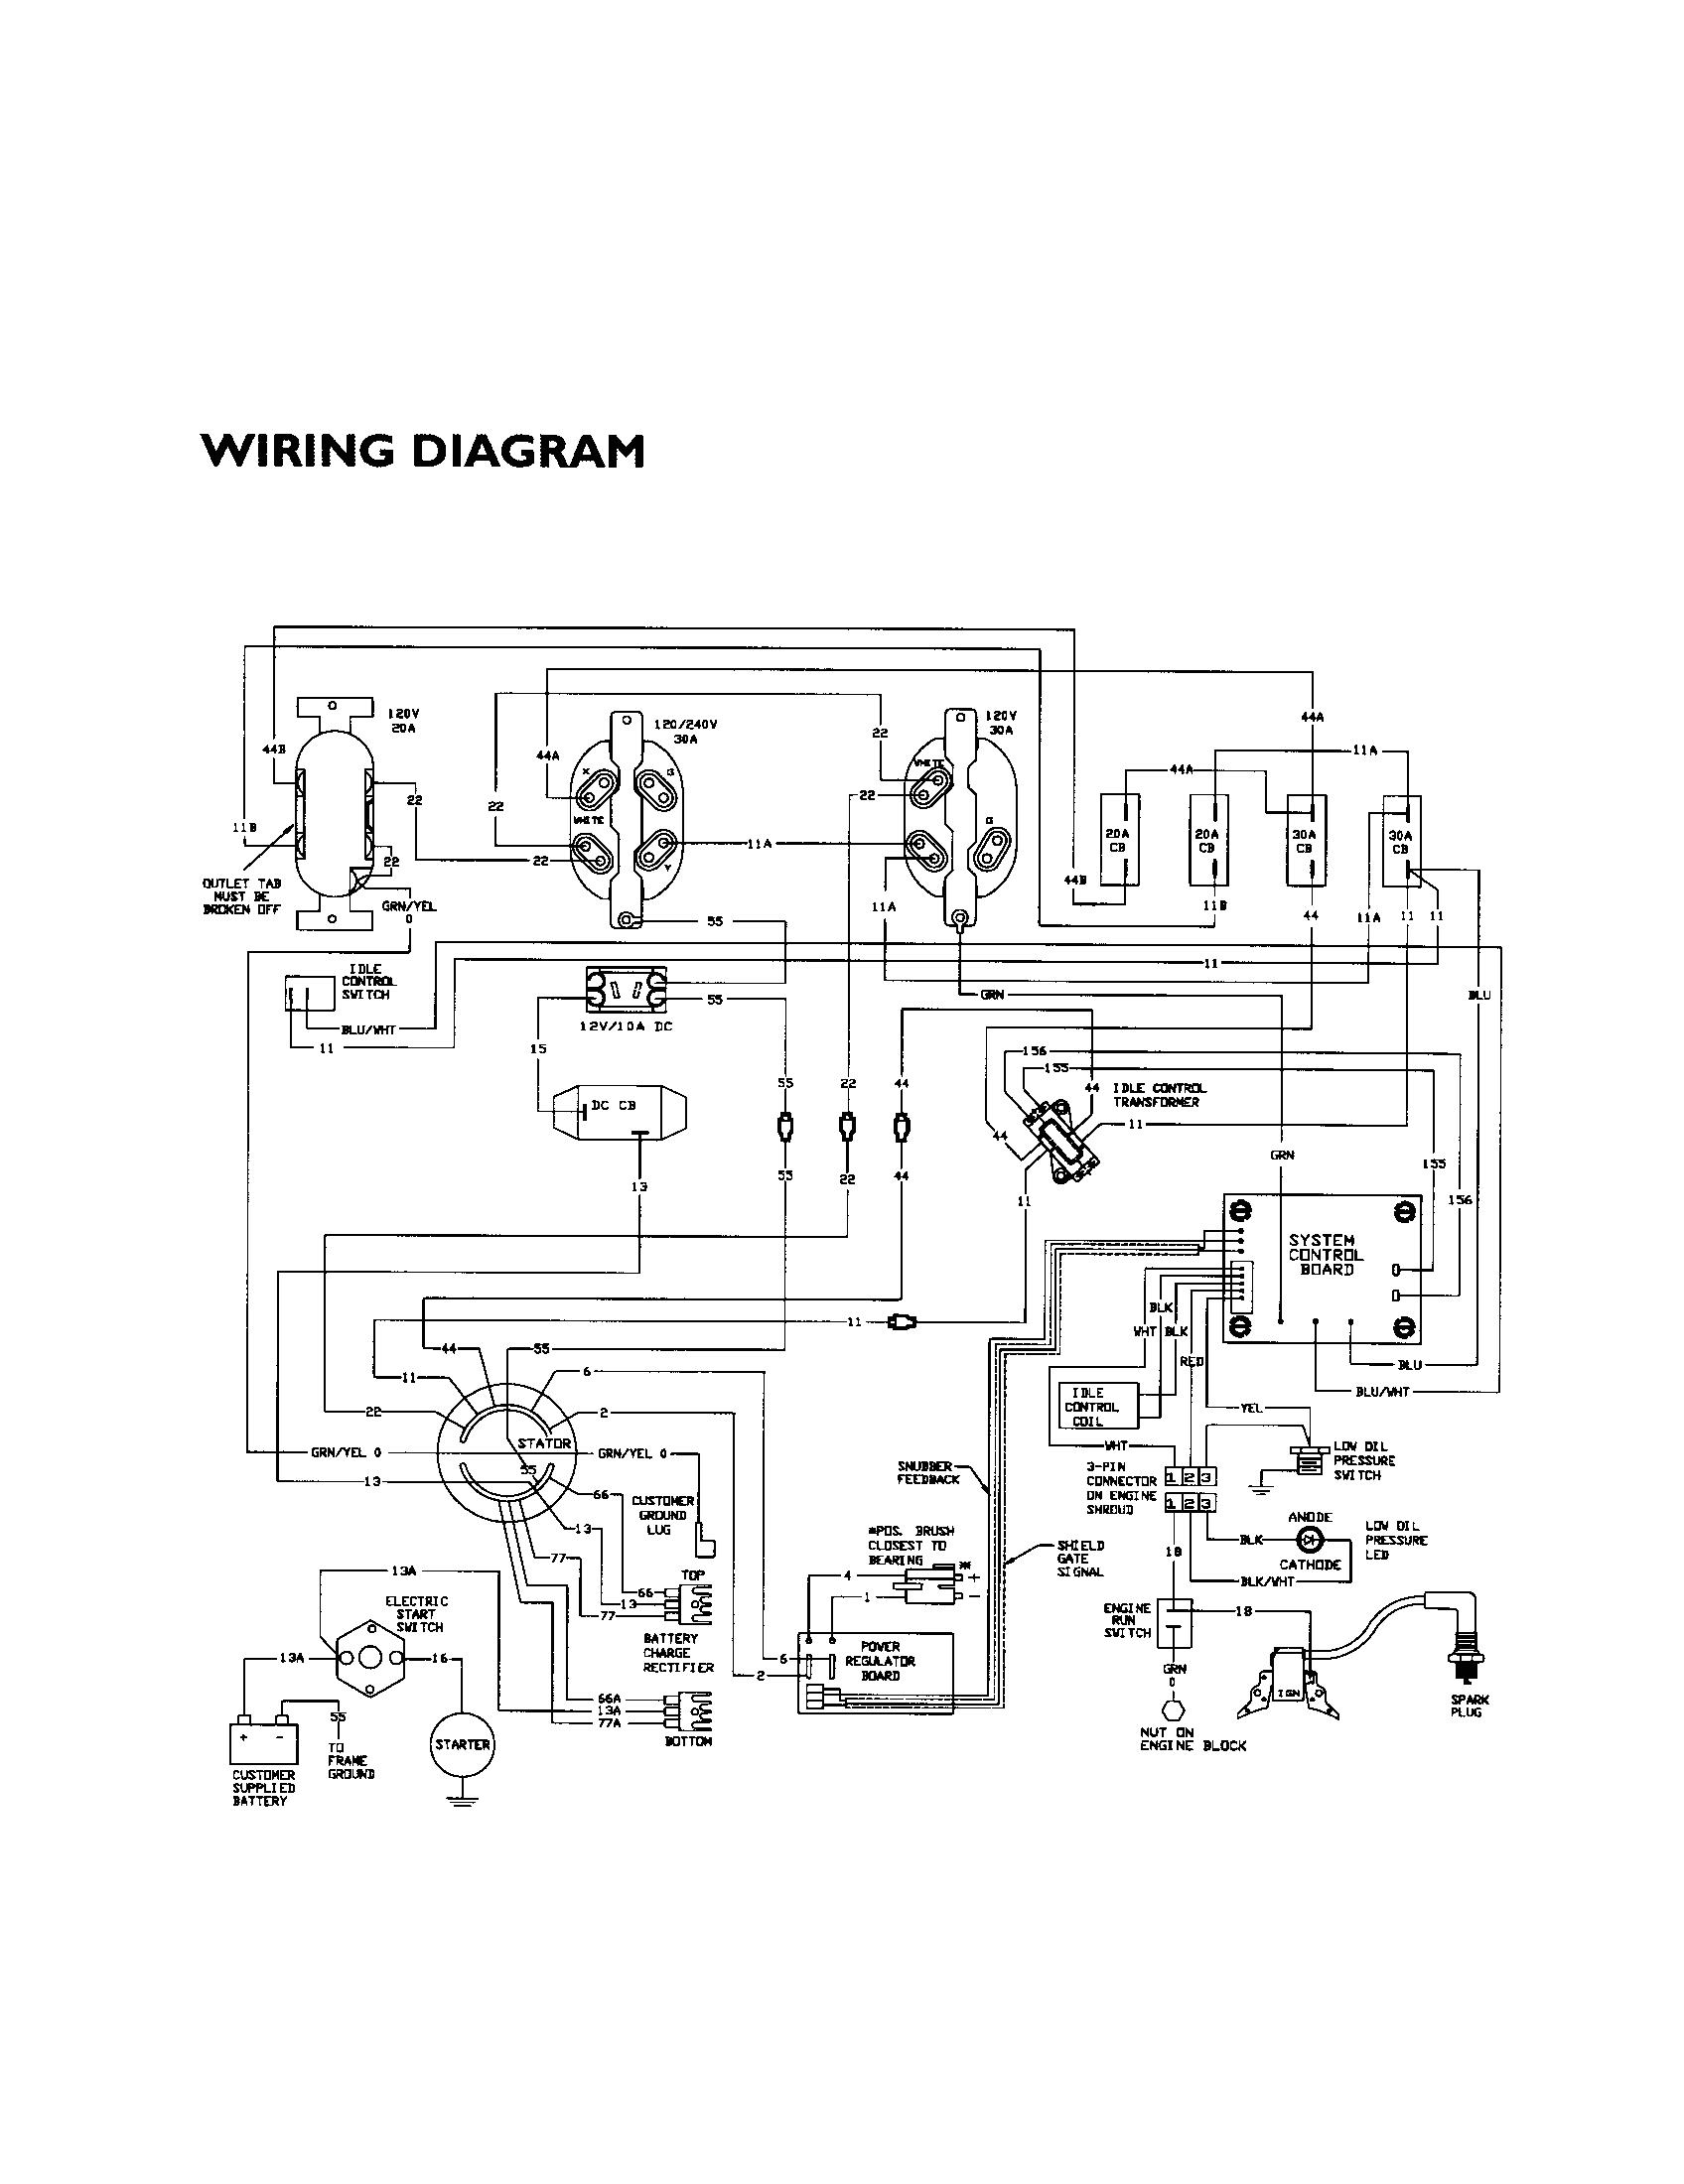 generator wire diagram wiring diagram tutorial onan rv generator wiring diagram generator generac wiring diagram wiring